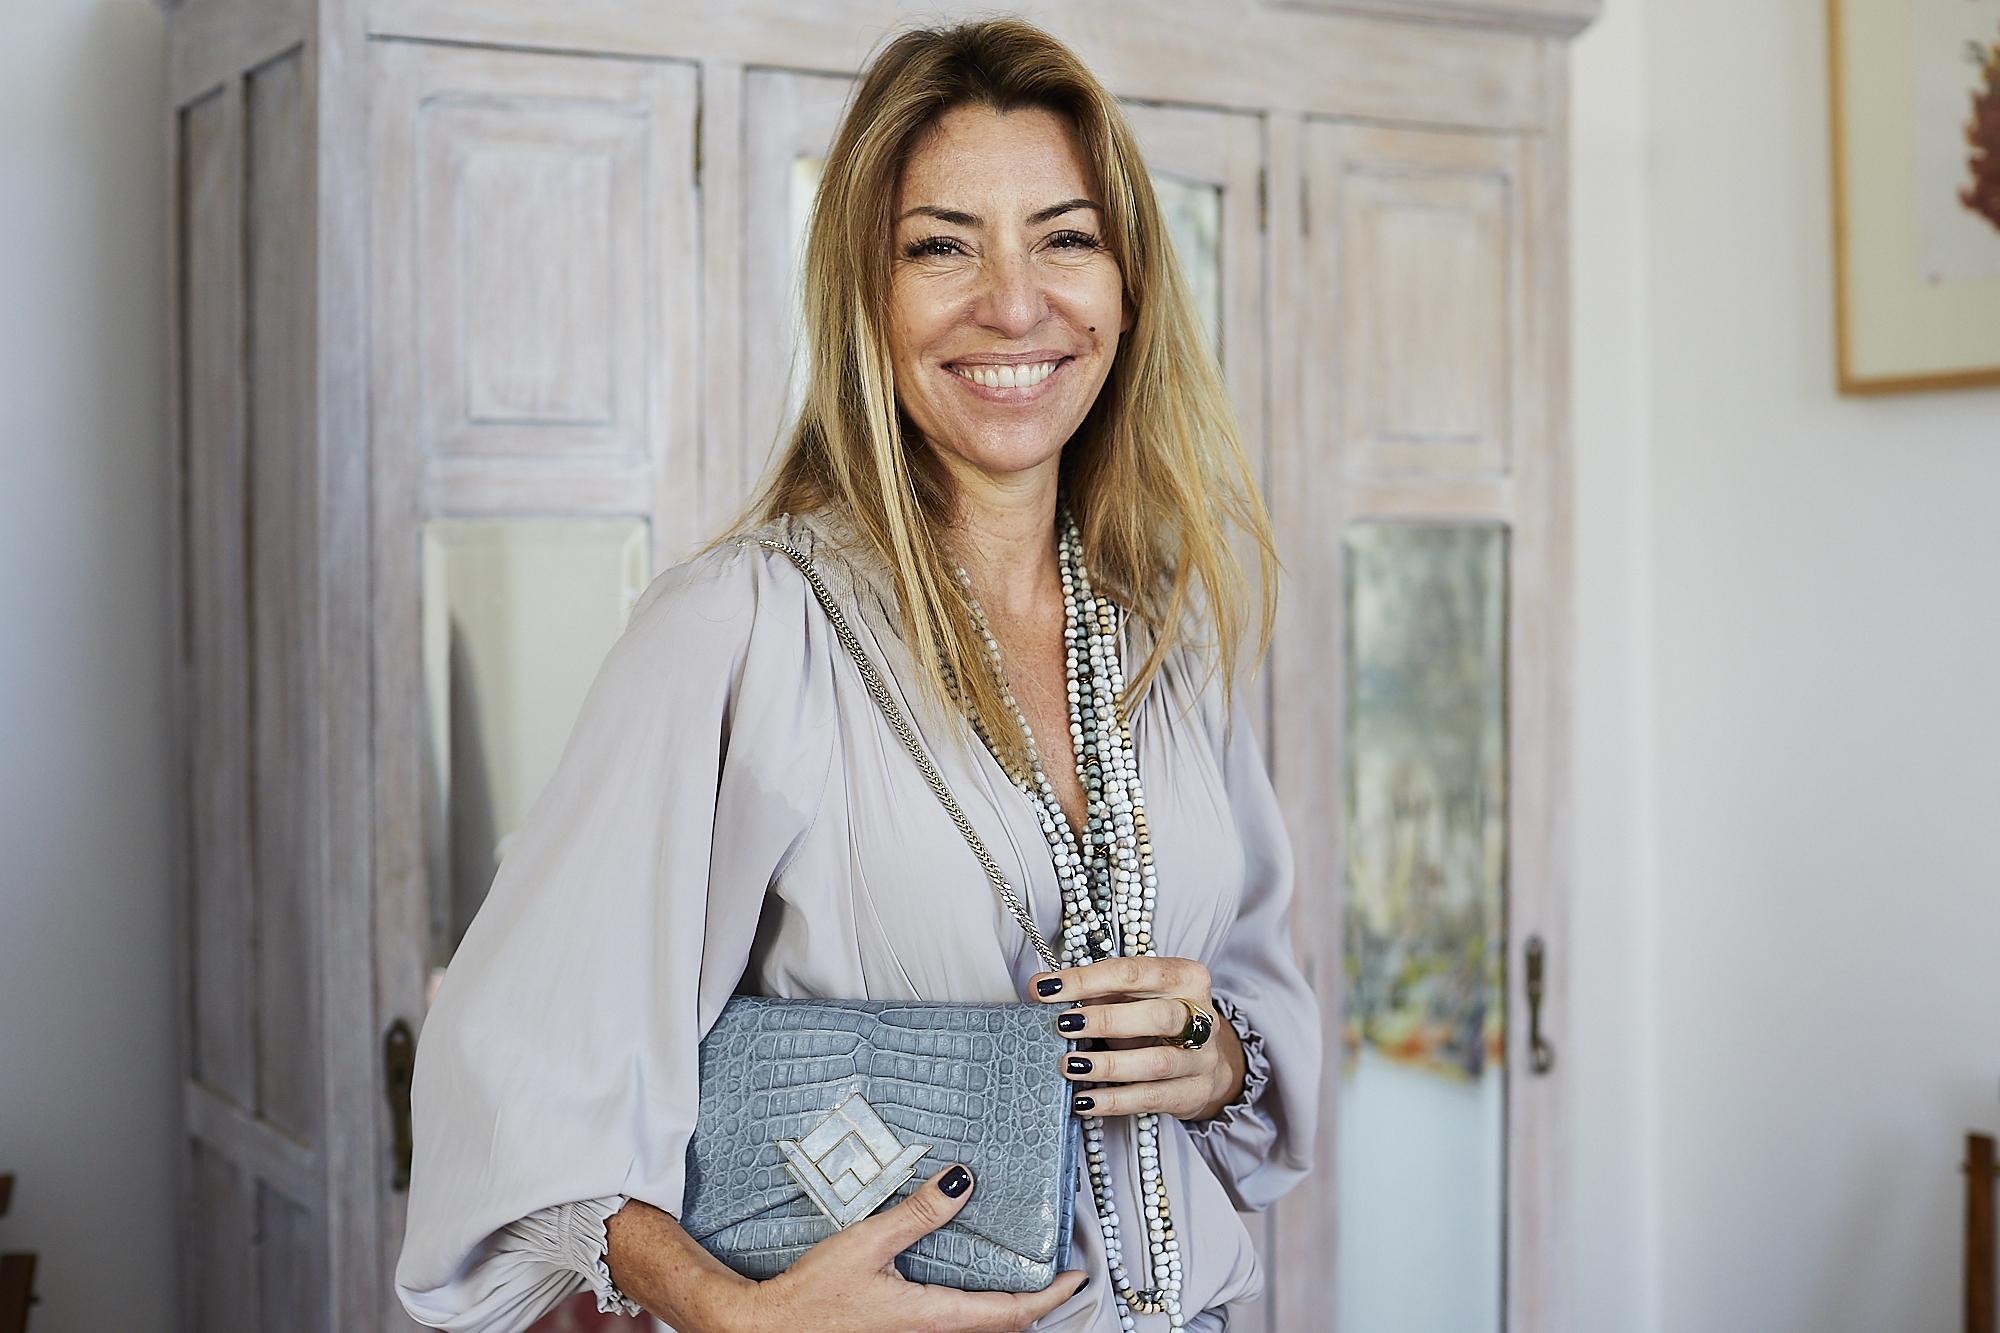 Mercedes Sanchez-Elia